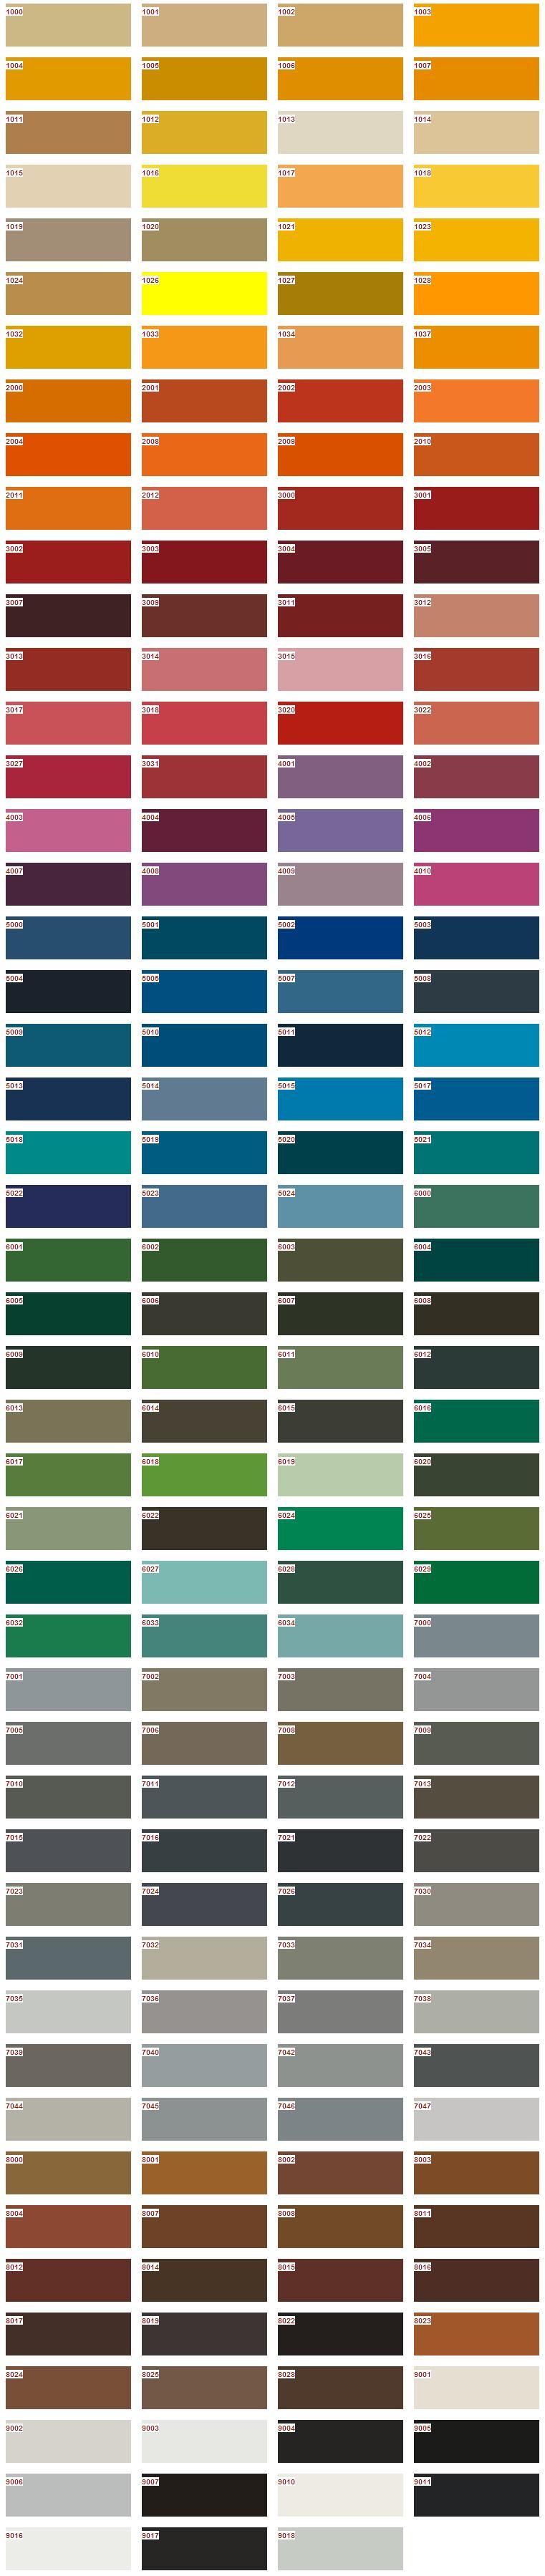 RAL-kleurenkaart